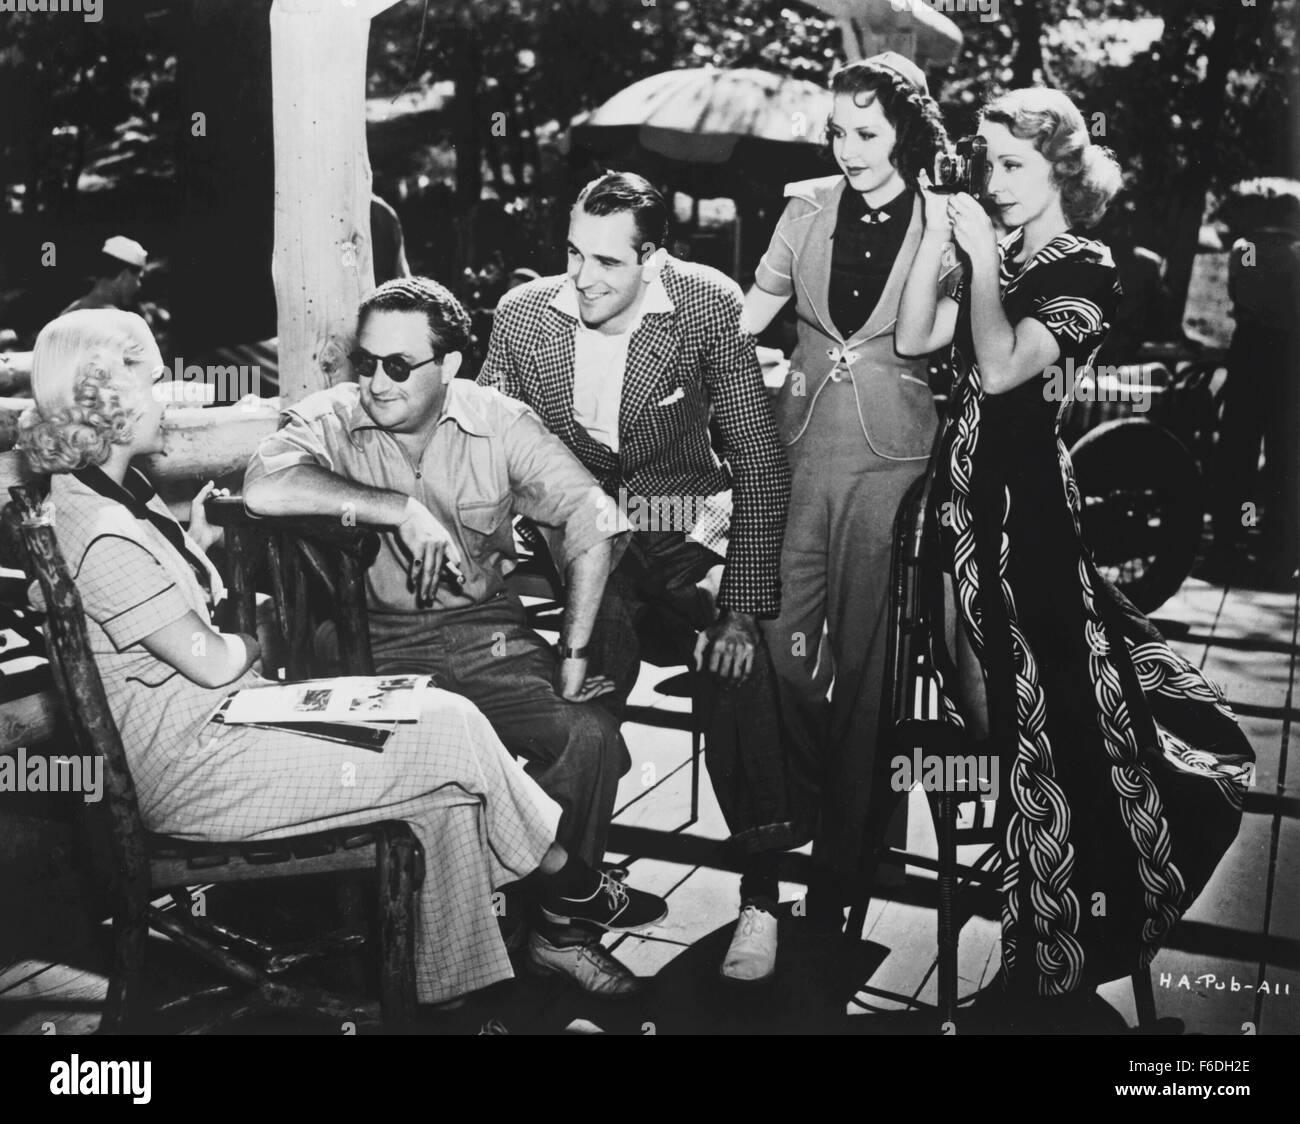 Douglas Fairbanks dating